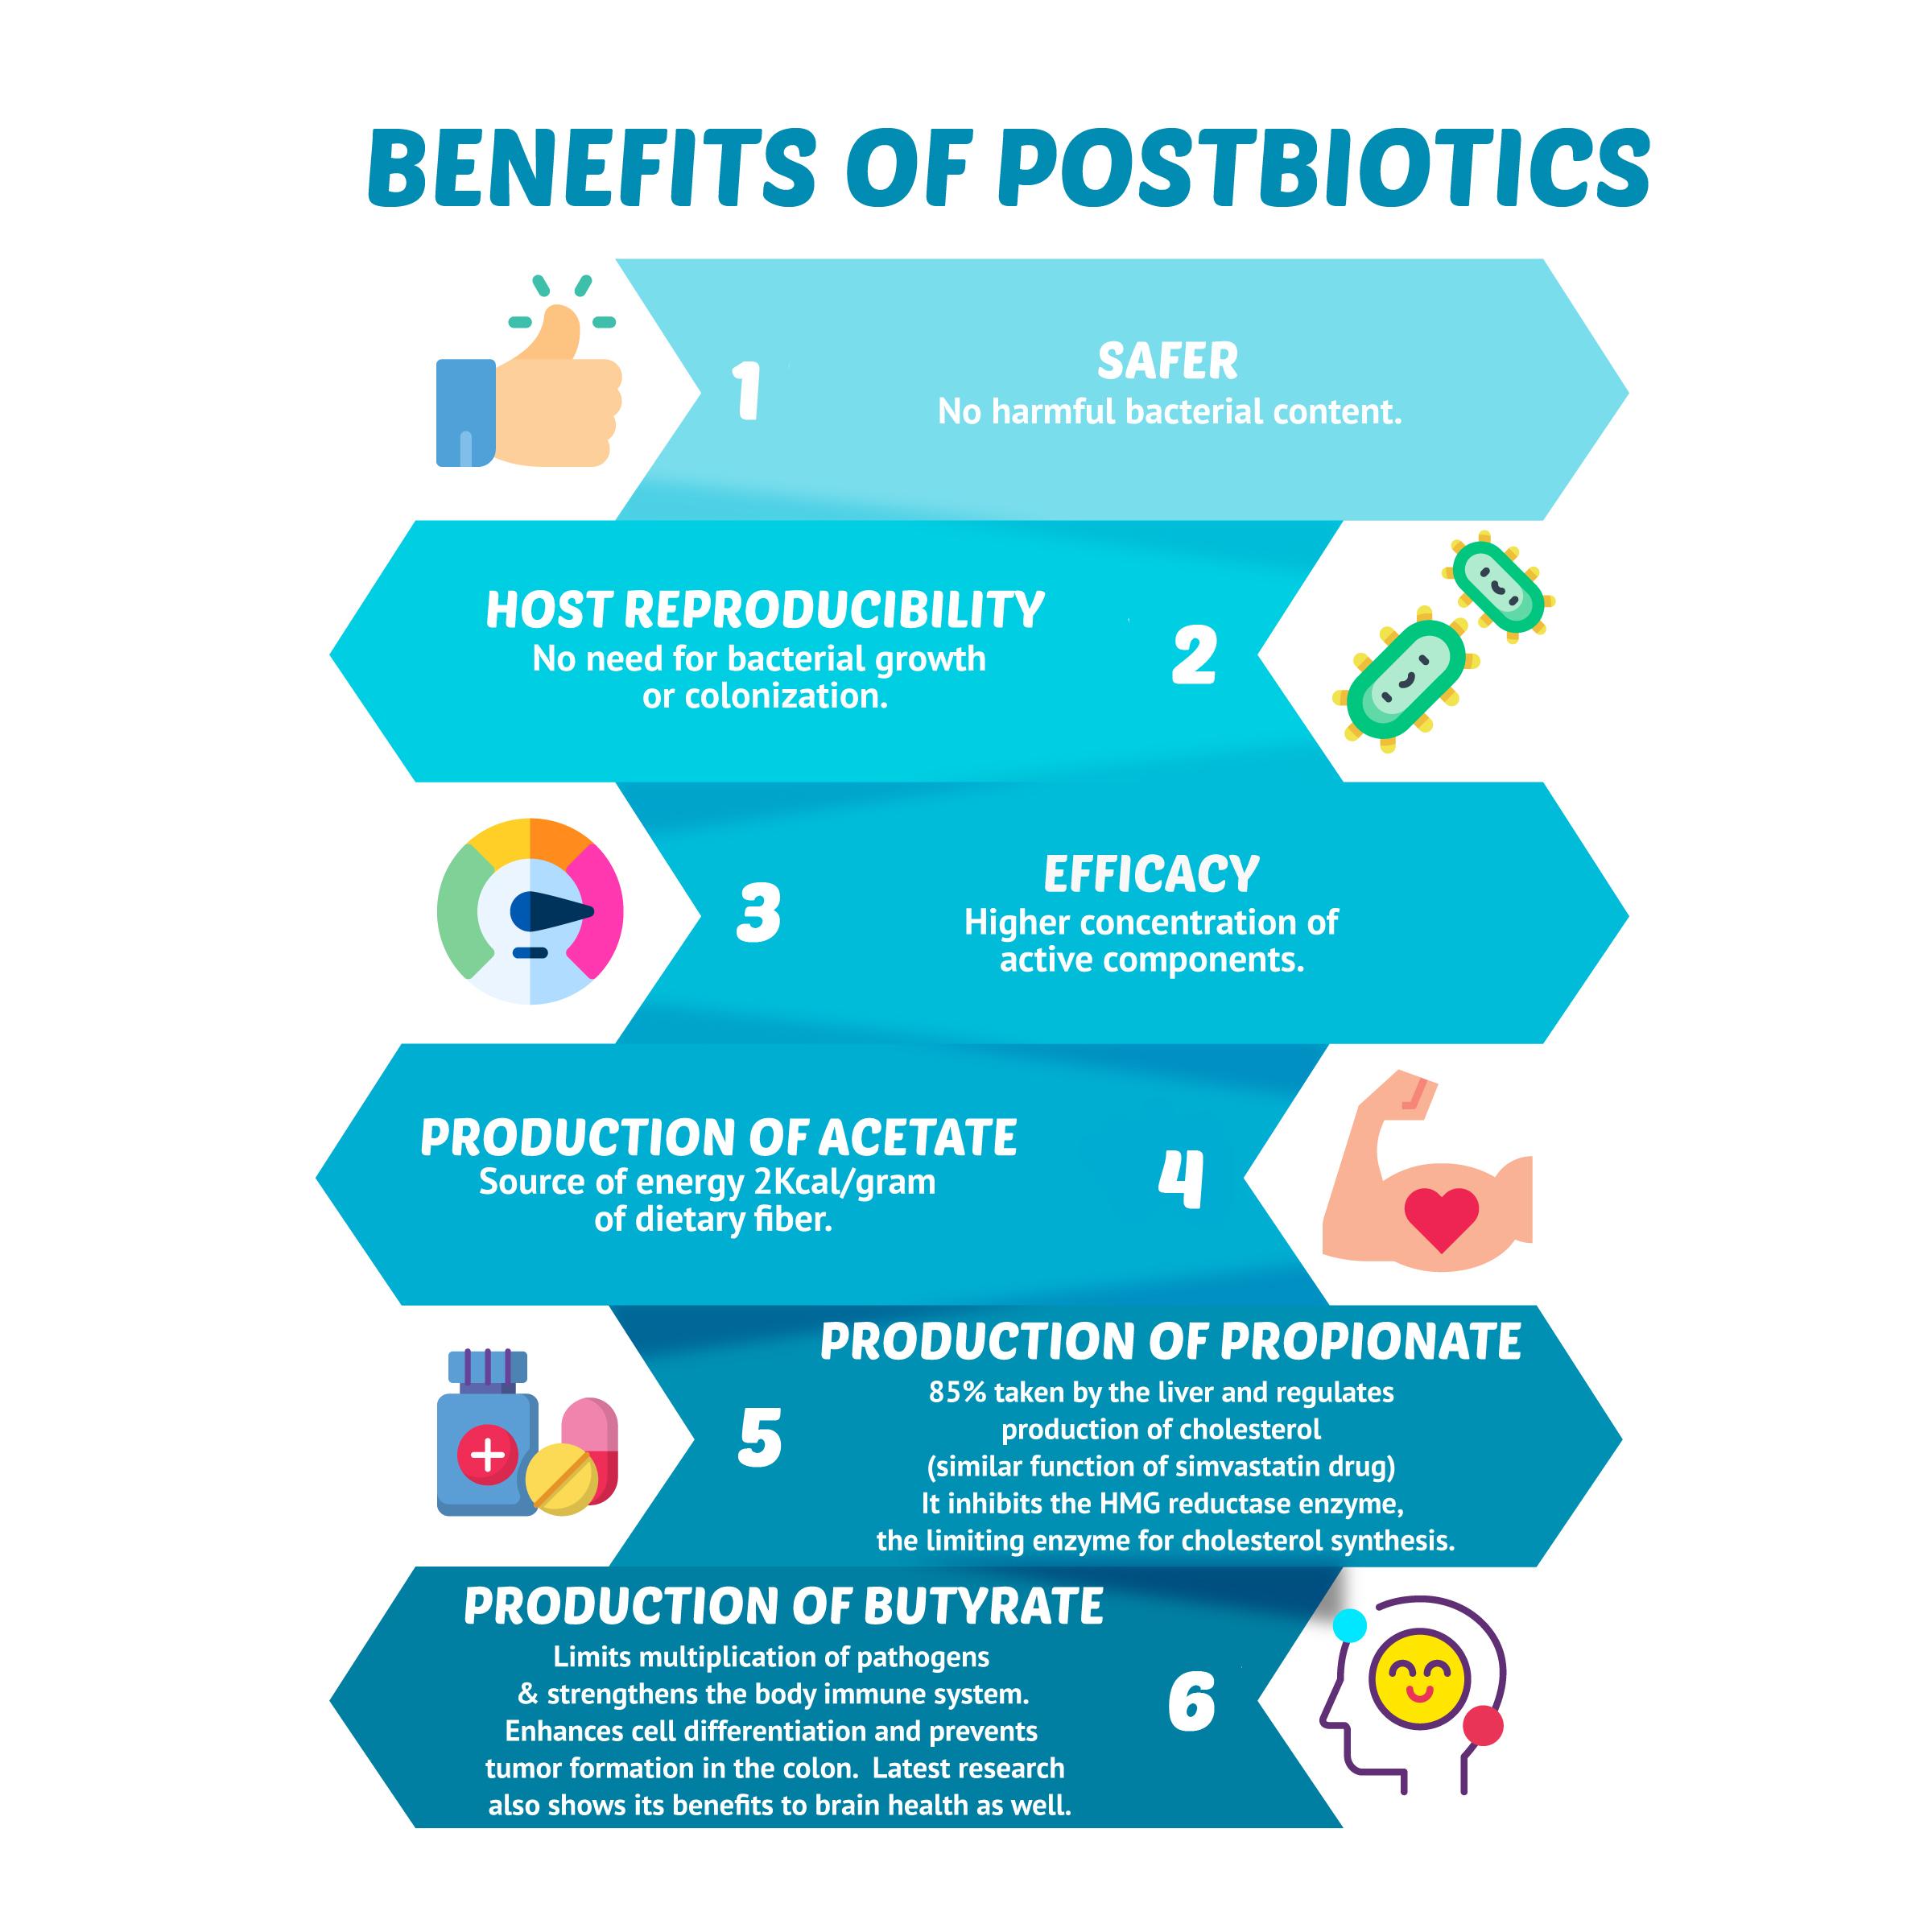 benefits of postbiotics